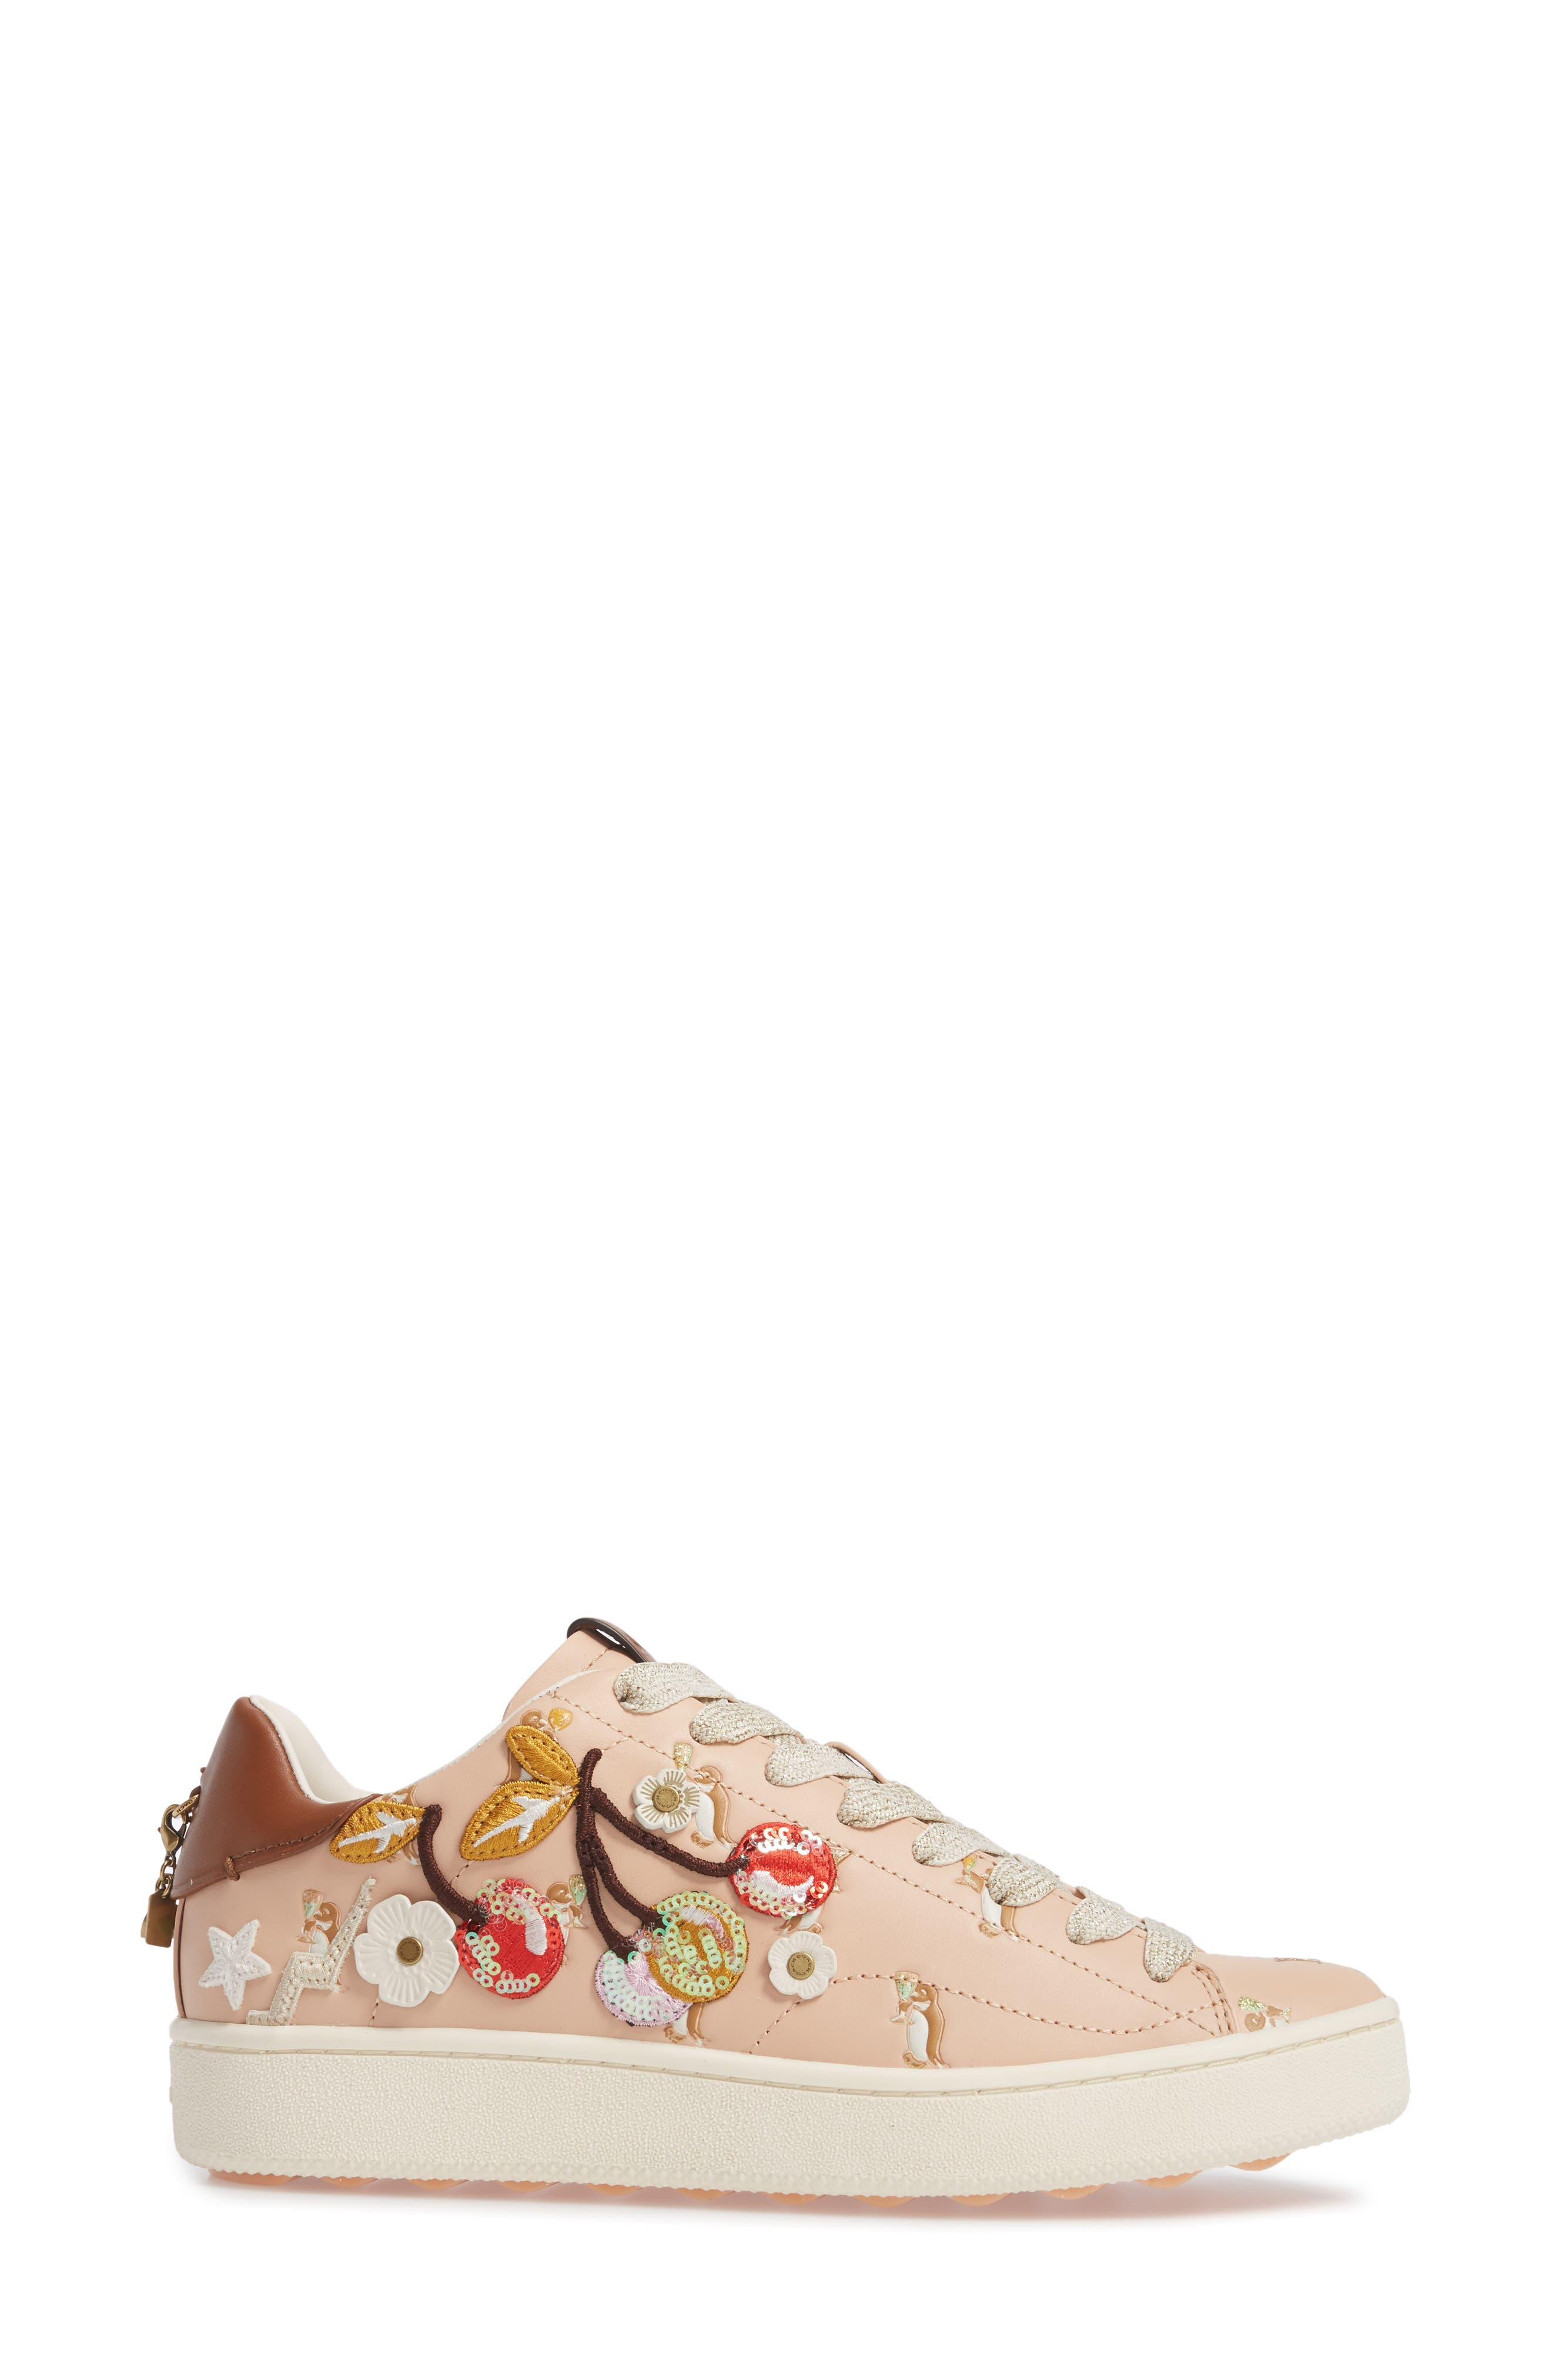 Patch Sneaker,                             Alternate thumbnail 3, color,                             650